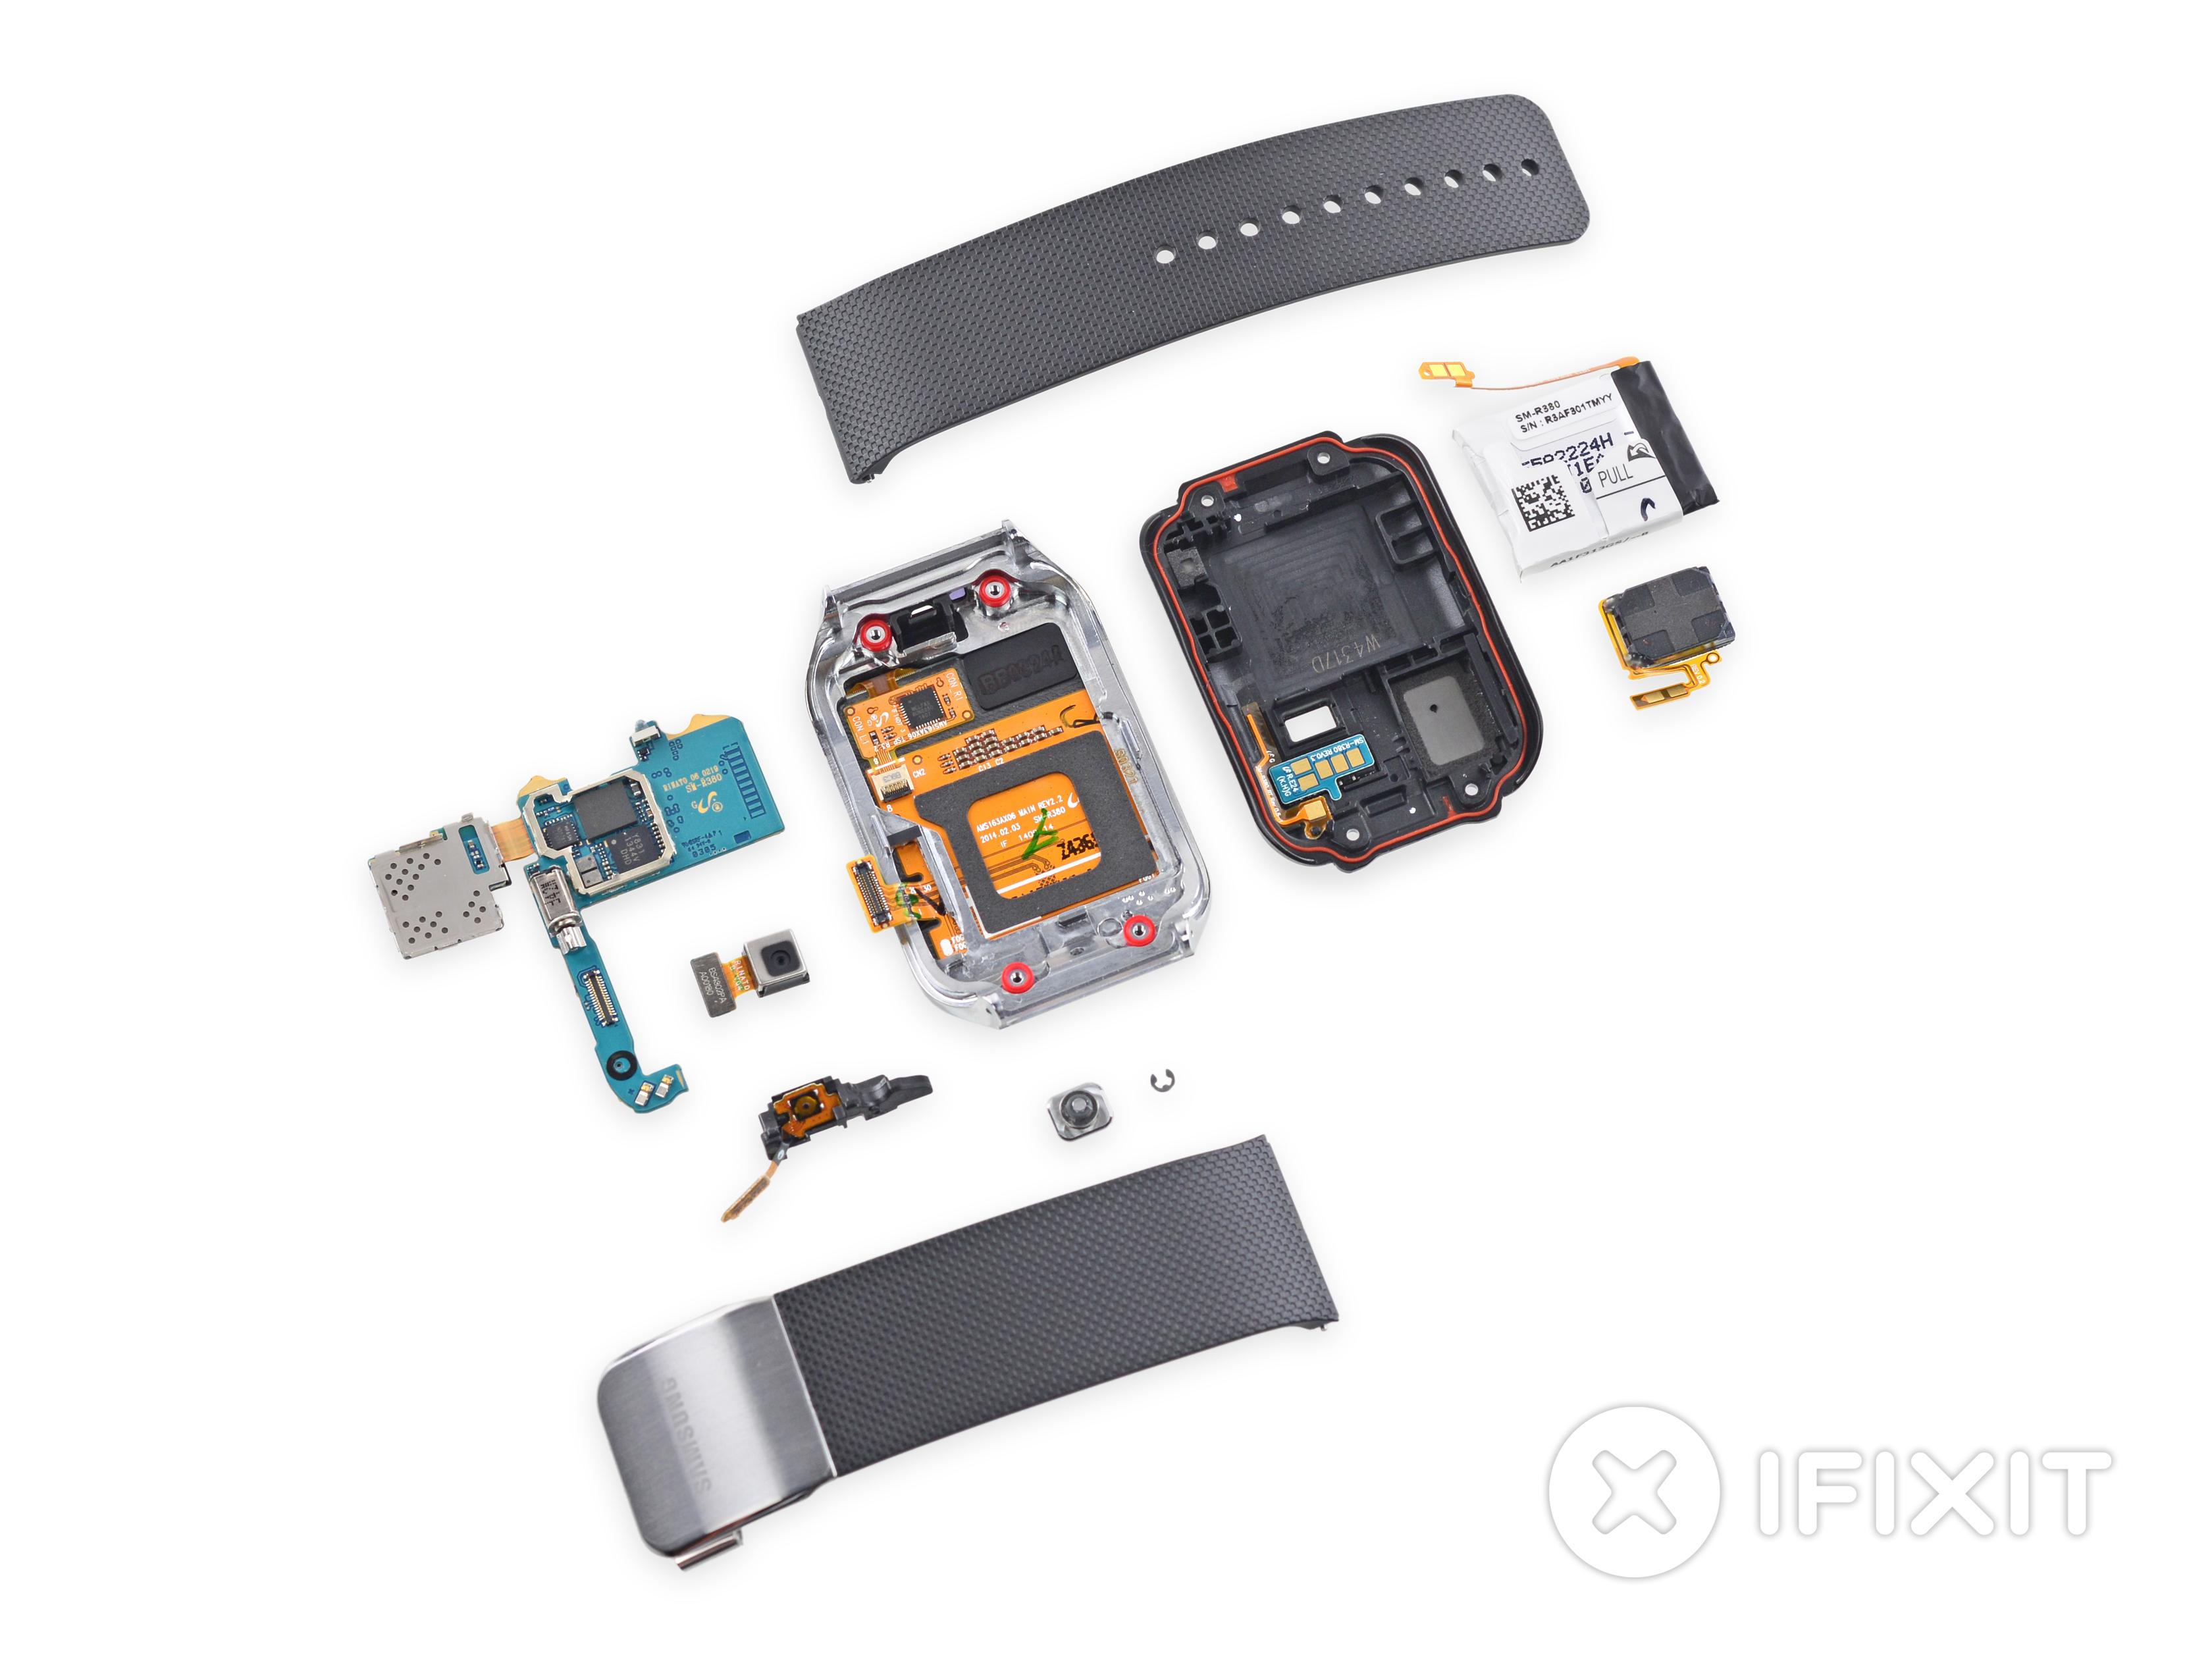 samsung gear 2 repair ifixit rh ifixit com Samsung G4 Samsung G2 Watch